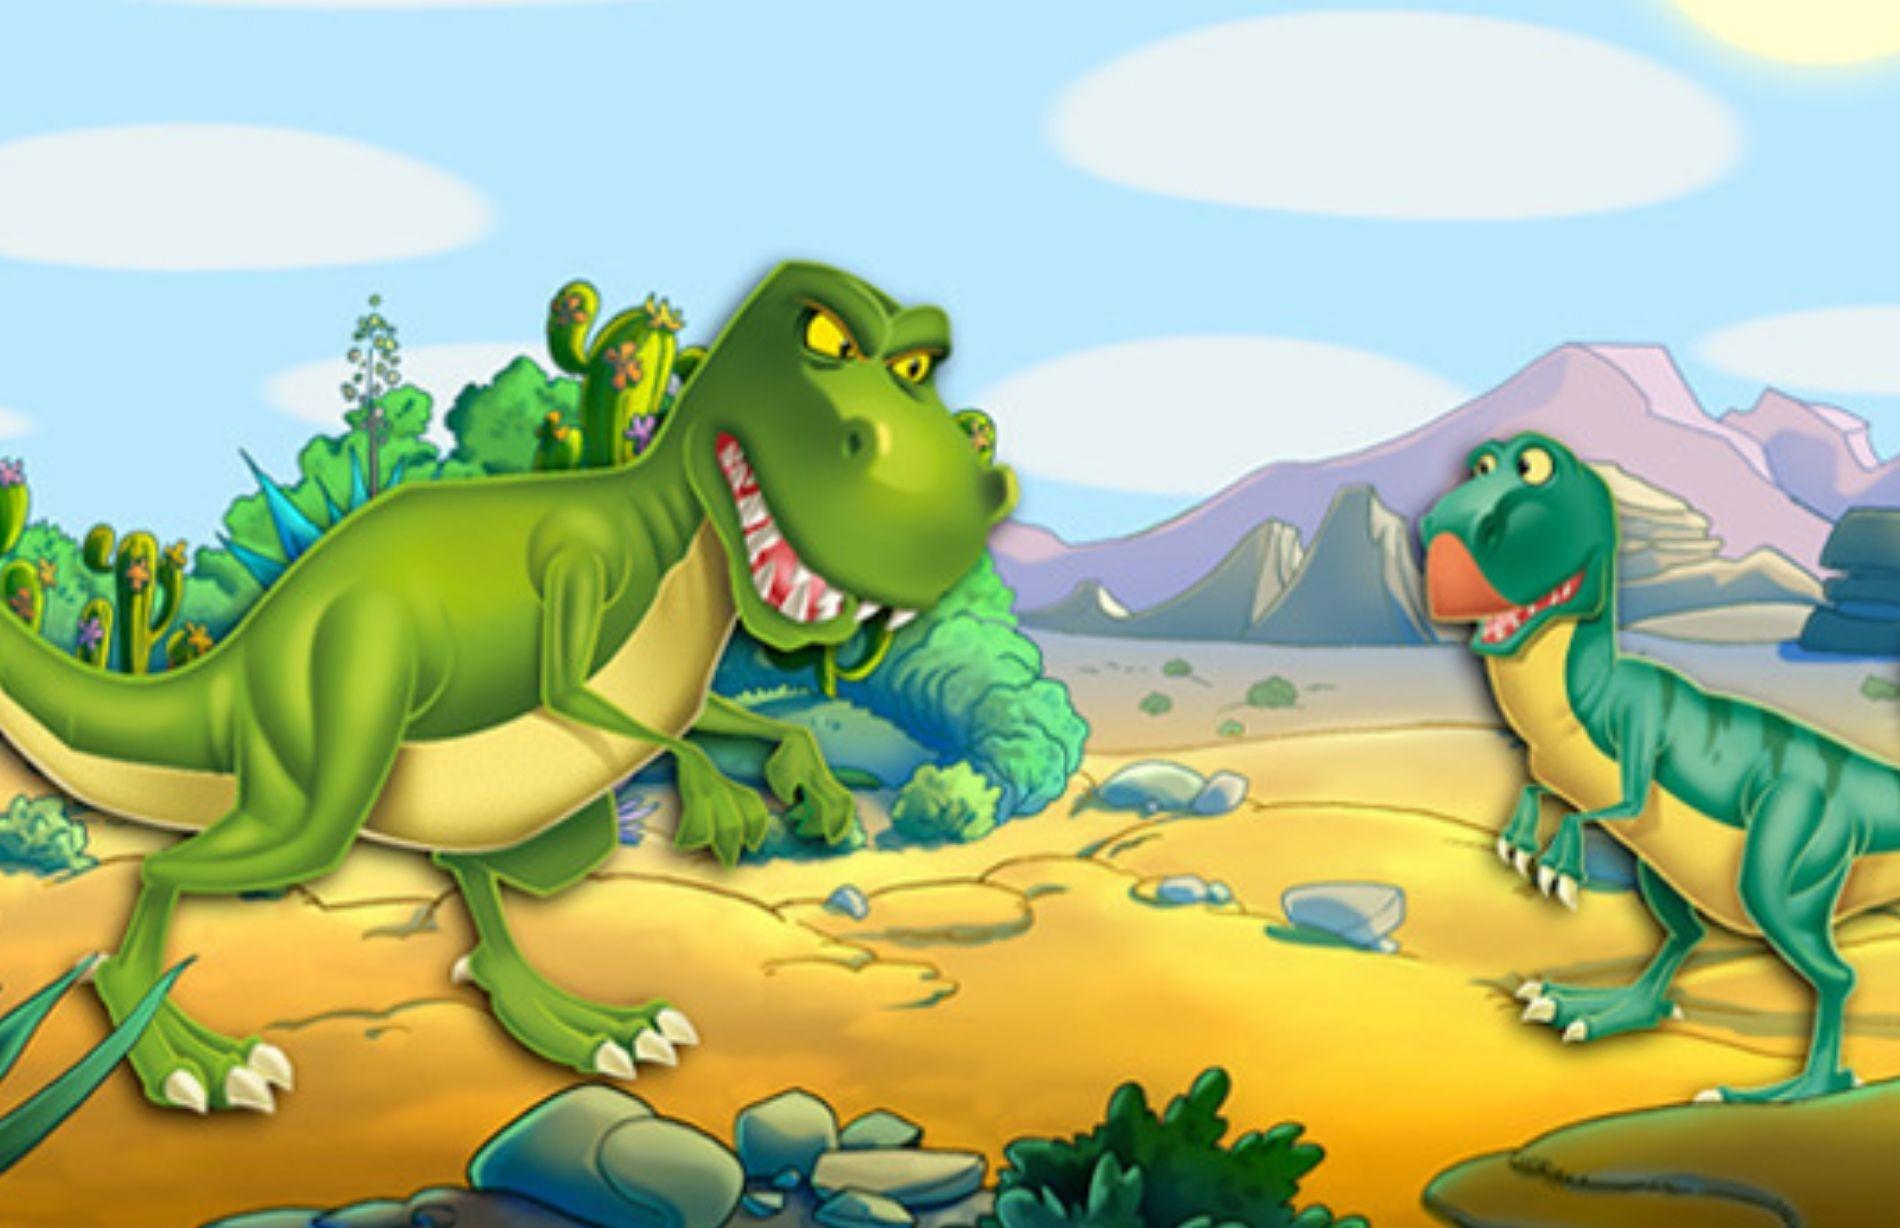 ultimo-t-rex-era-bullo